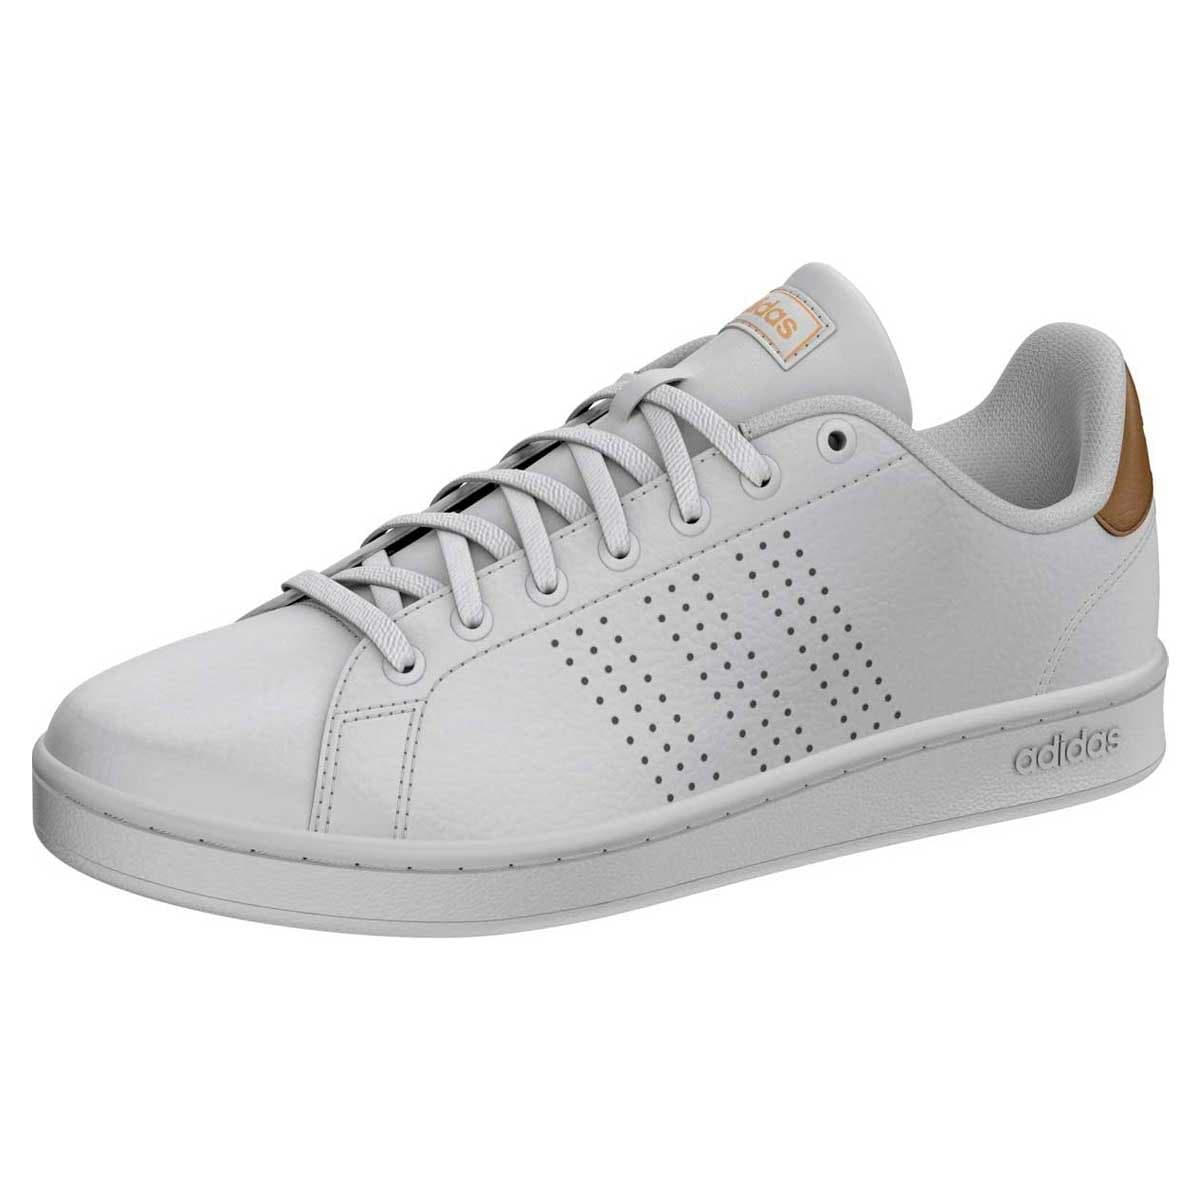 Tenis Casual Advantage Blanco Adidas para Dama